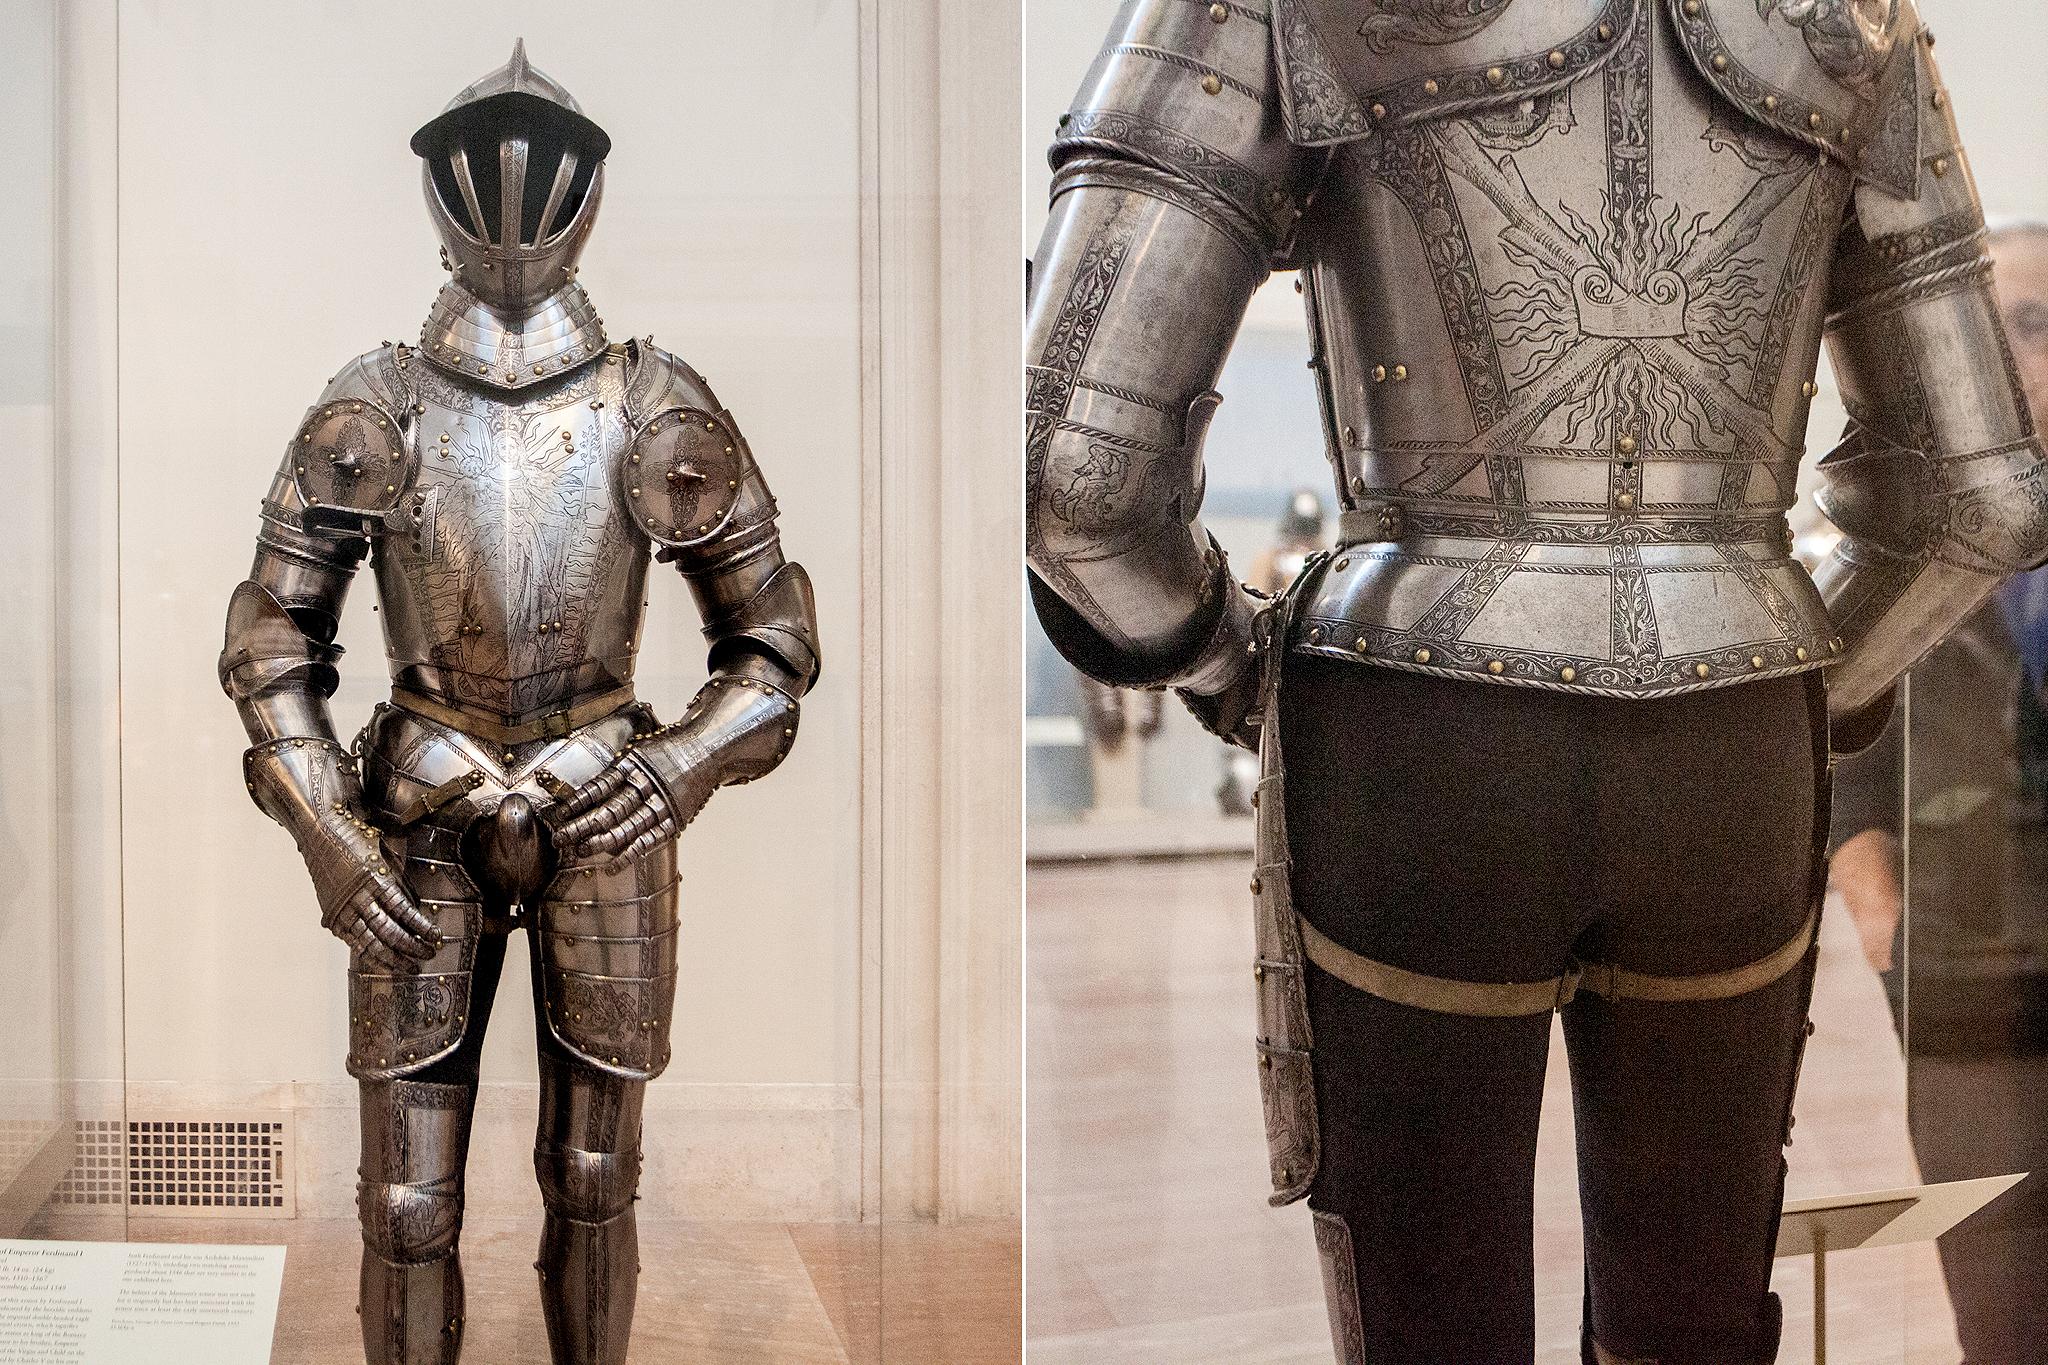 Armor of Emperor Ferdinand I, 1549